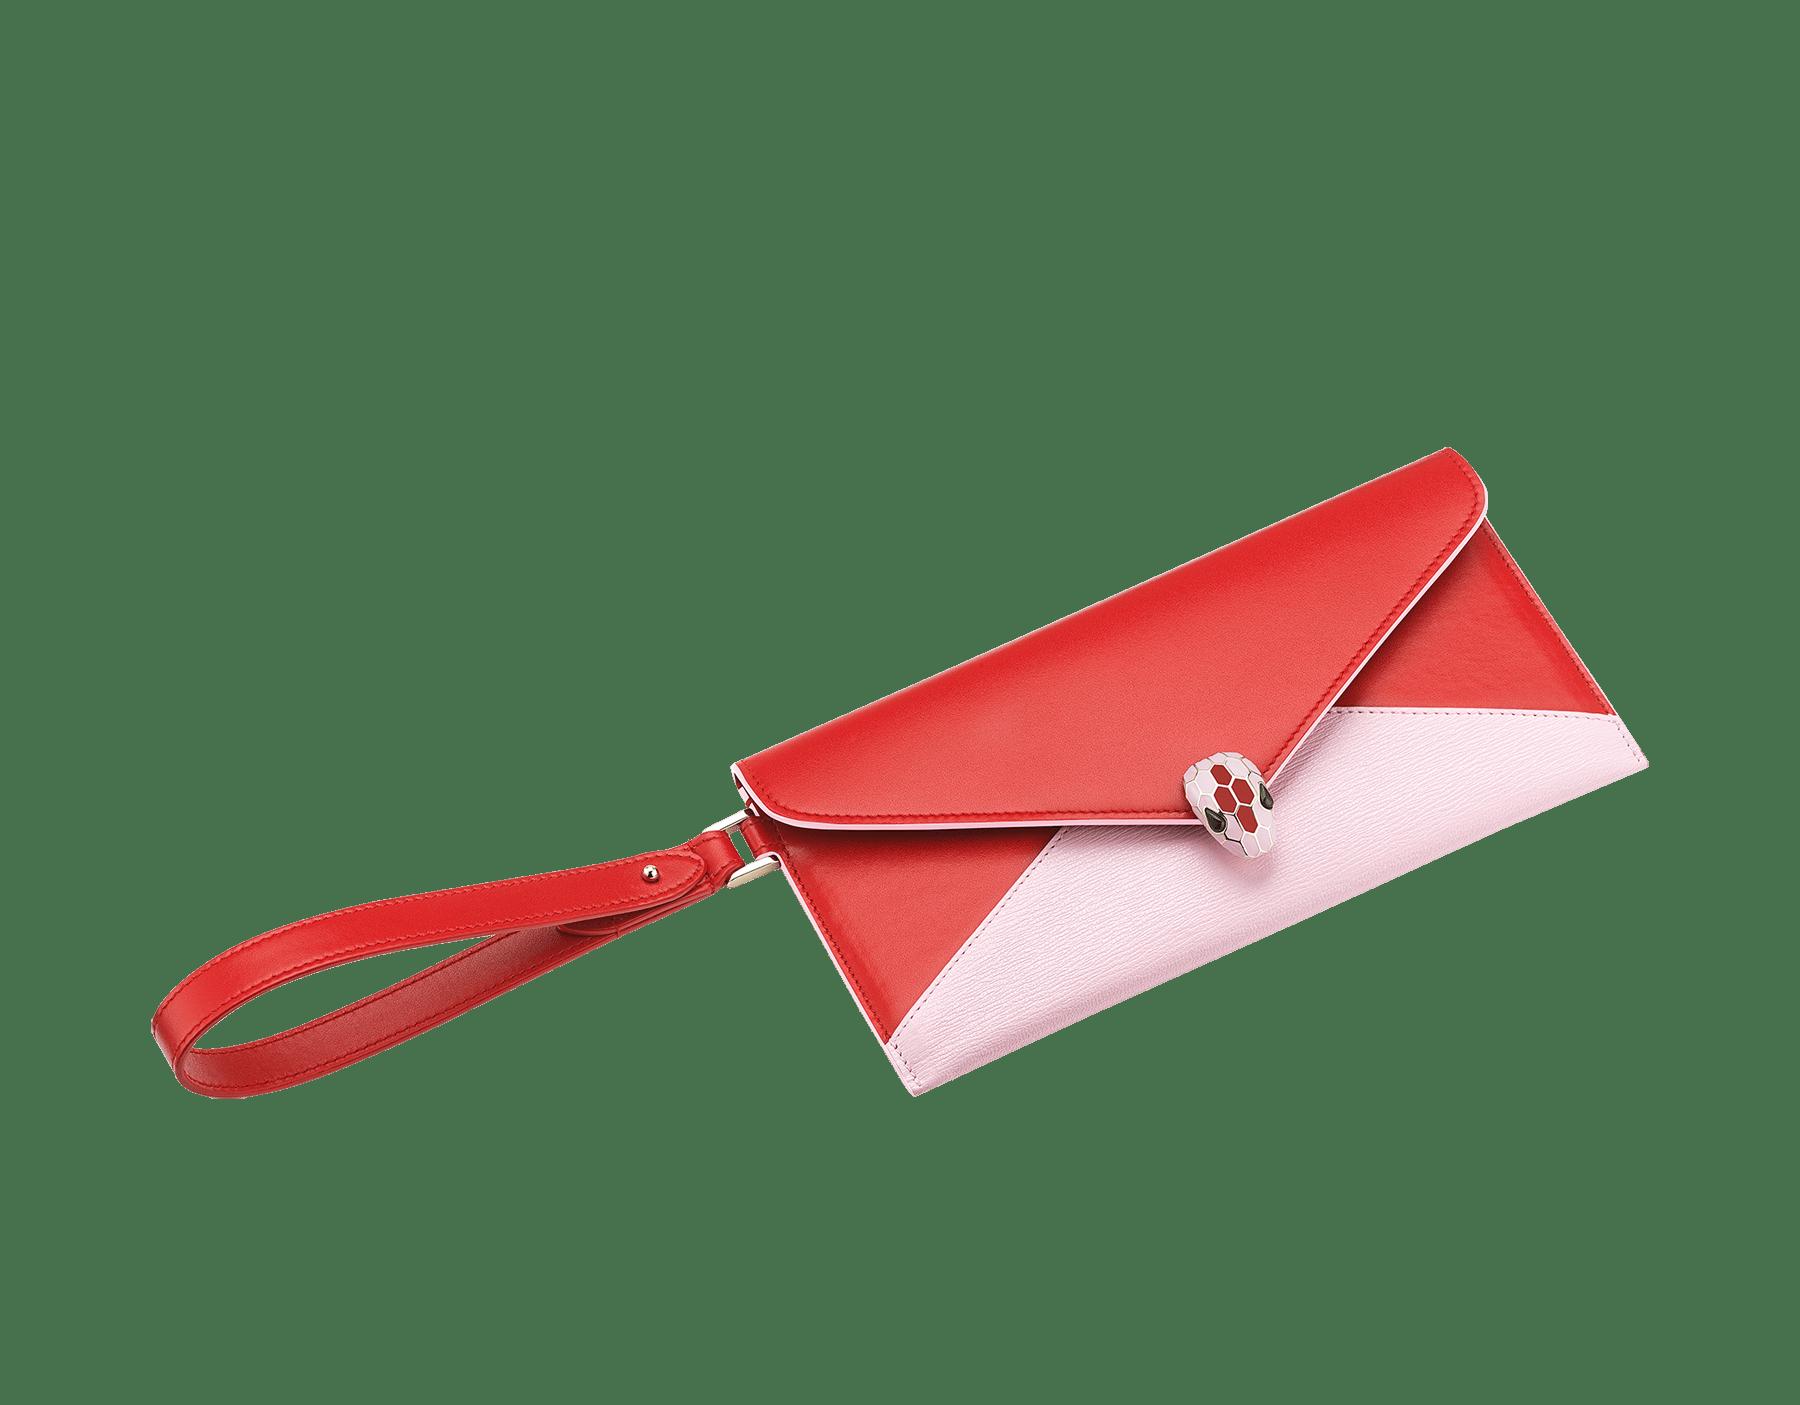 Serpenti Forever 信封型手拿包,採用洋紅碧玉色小牛皮和法國玫瑰色羊皮。經典蛇頭元素飾以法國玫瑰色和洋紅碧玉色琺瑯,蛇眼鑲飾黑色縞瑪瑙。 289461 image 1